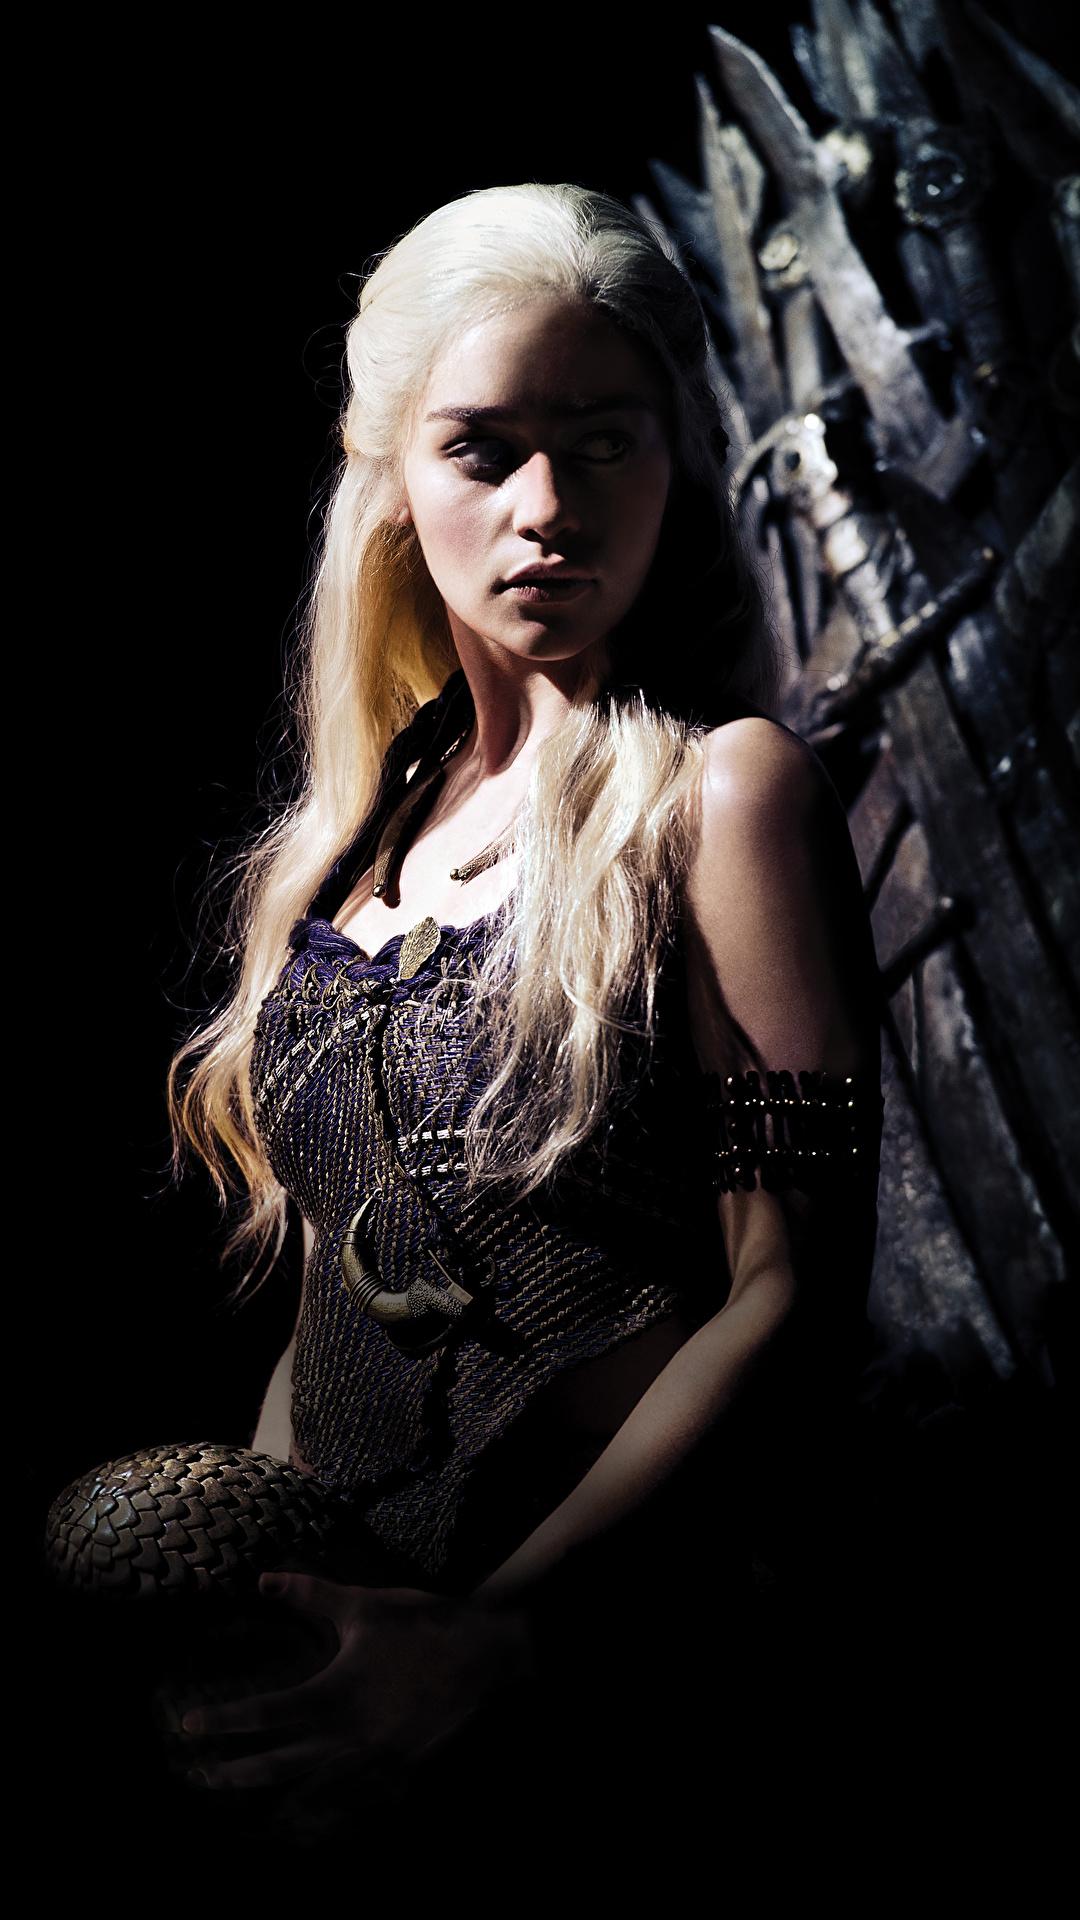 Photos Game Of Thrones Daenerys Targaryen Emilia Clarke 1080x1920